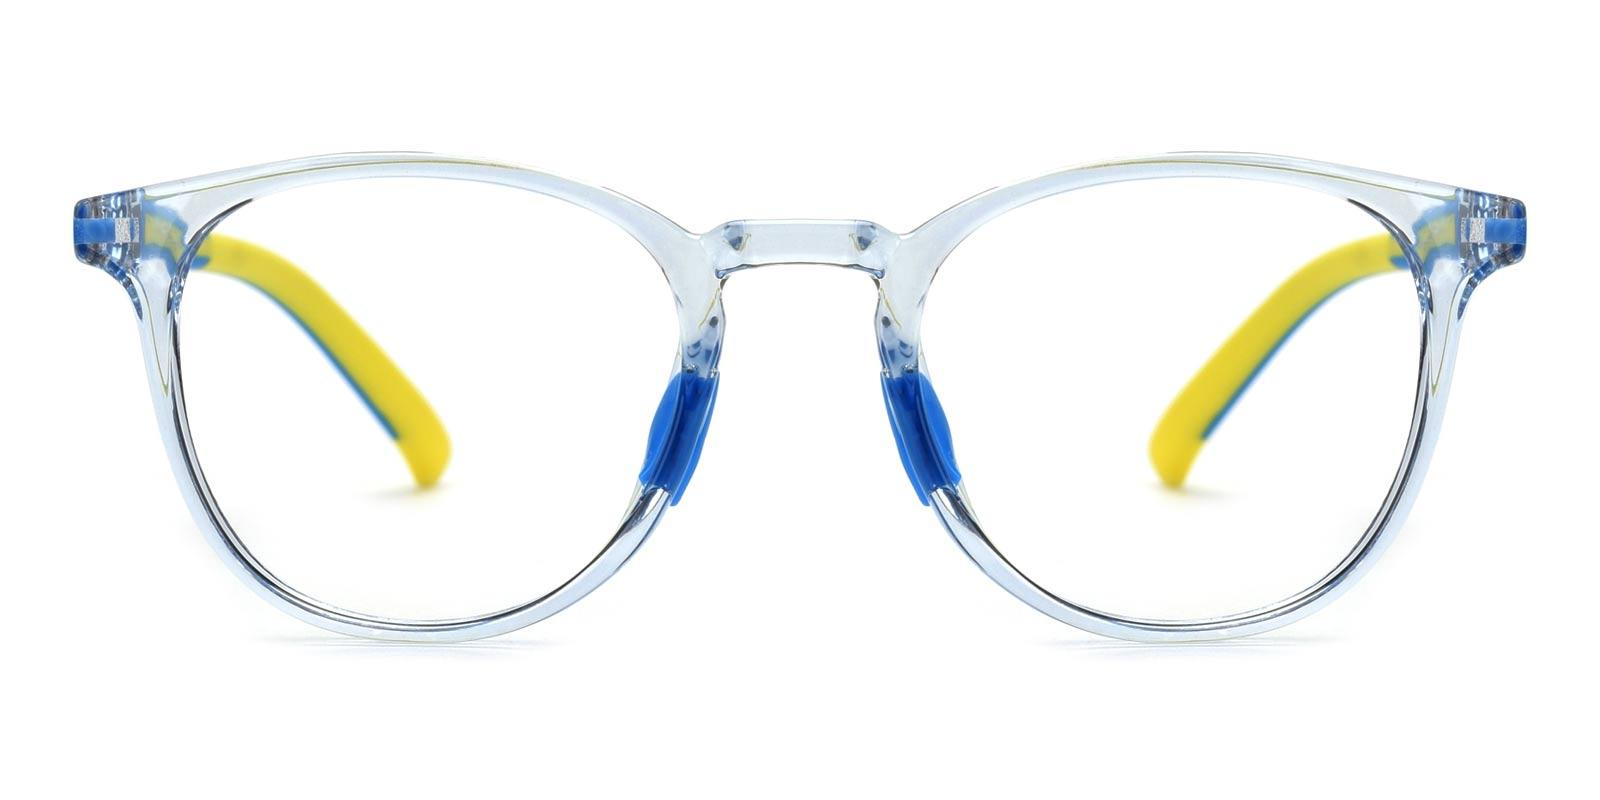 Elvis-Translucent-Round-Plastic-Eyeglasses-detail